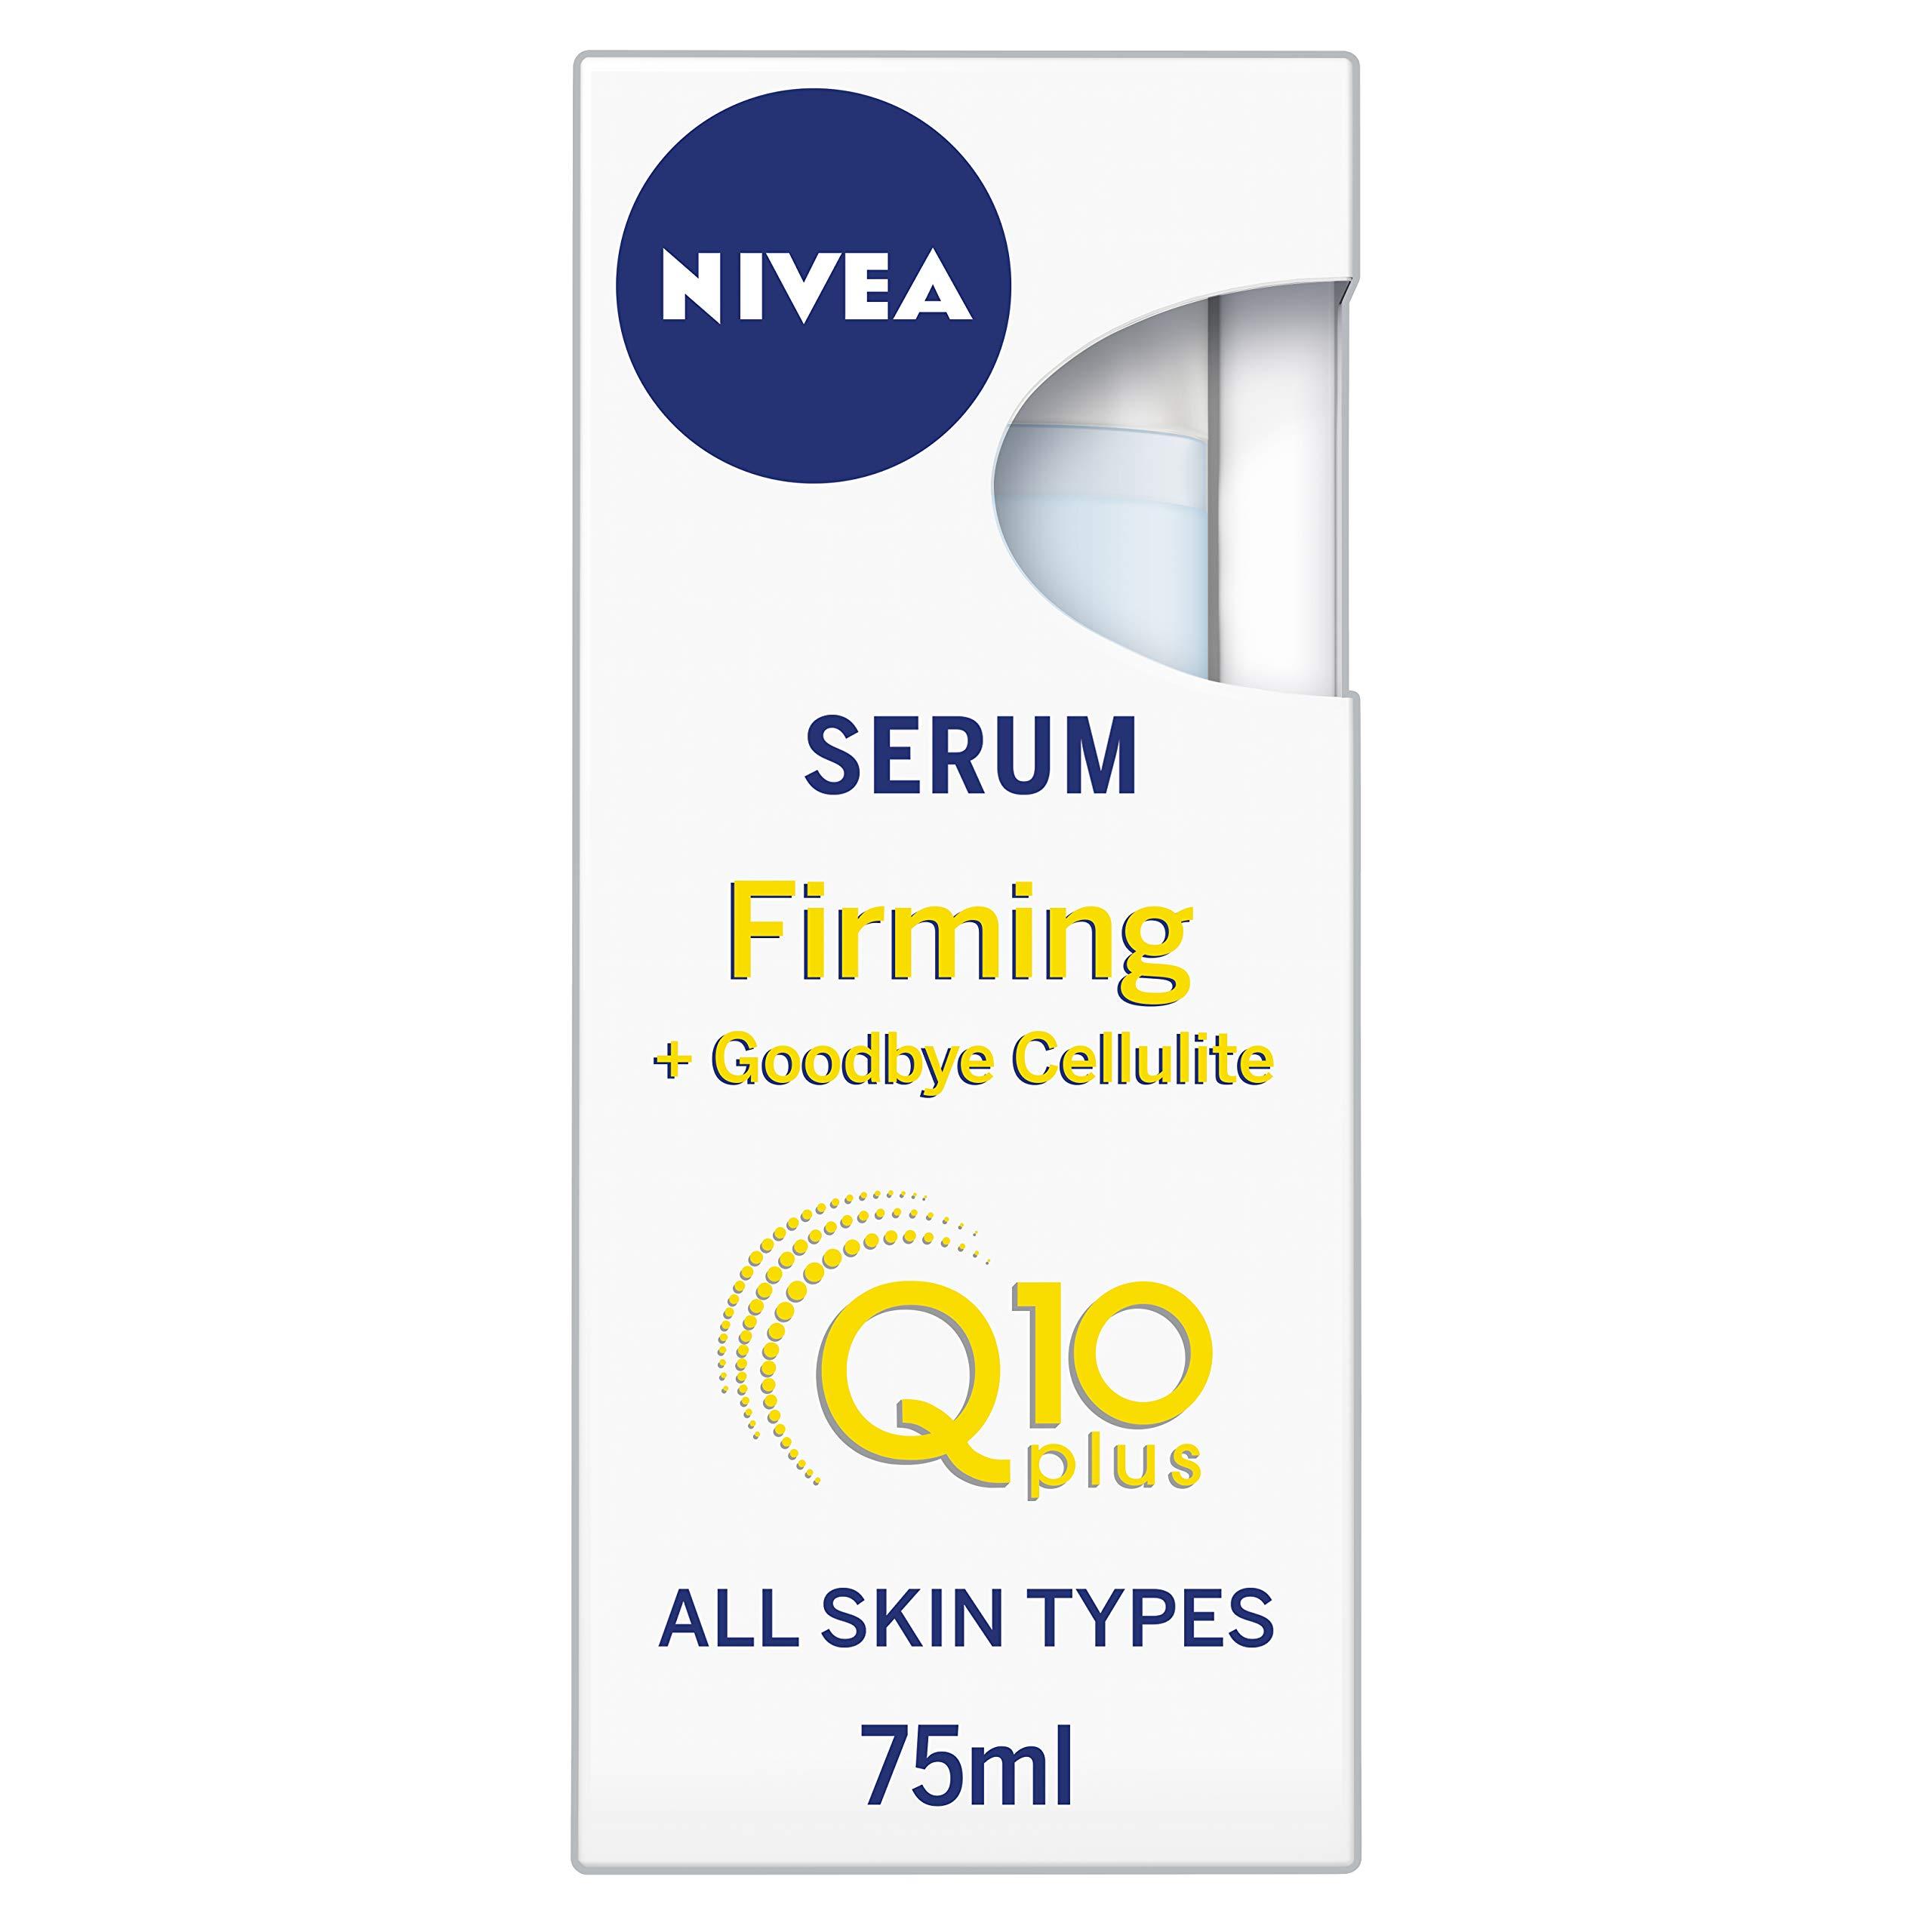 NIVEA Firming Good Bye Cellulite Serum